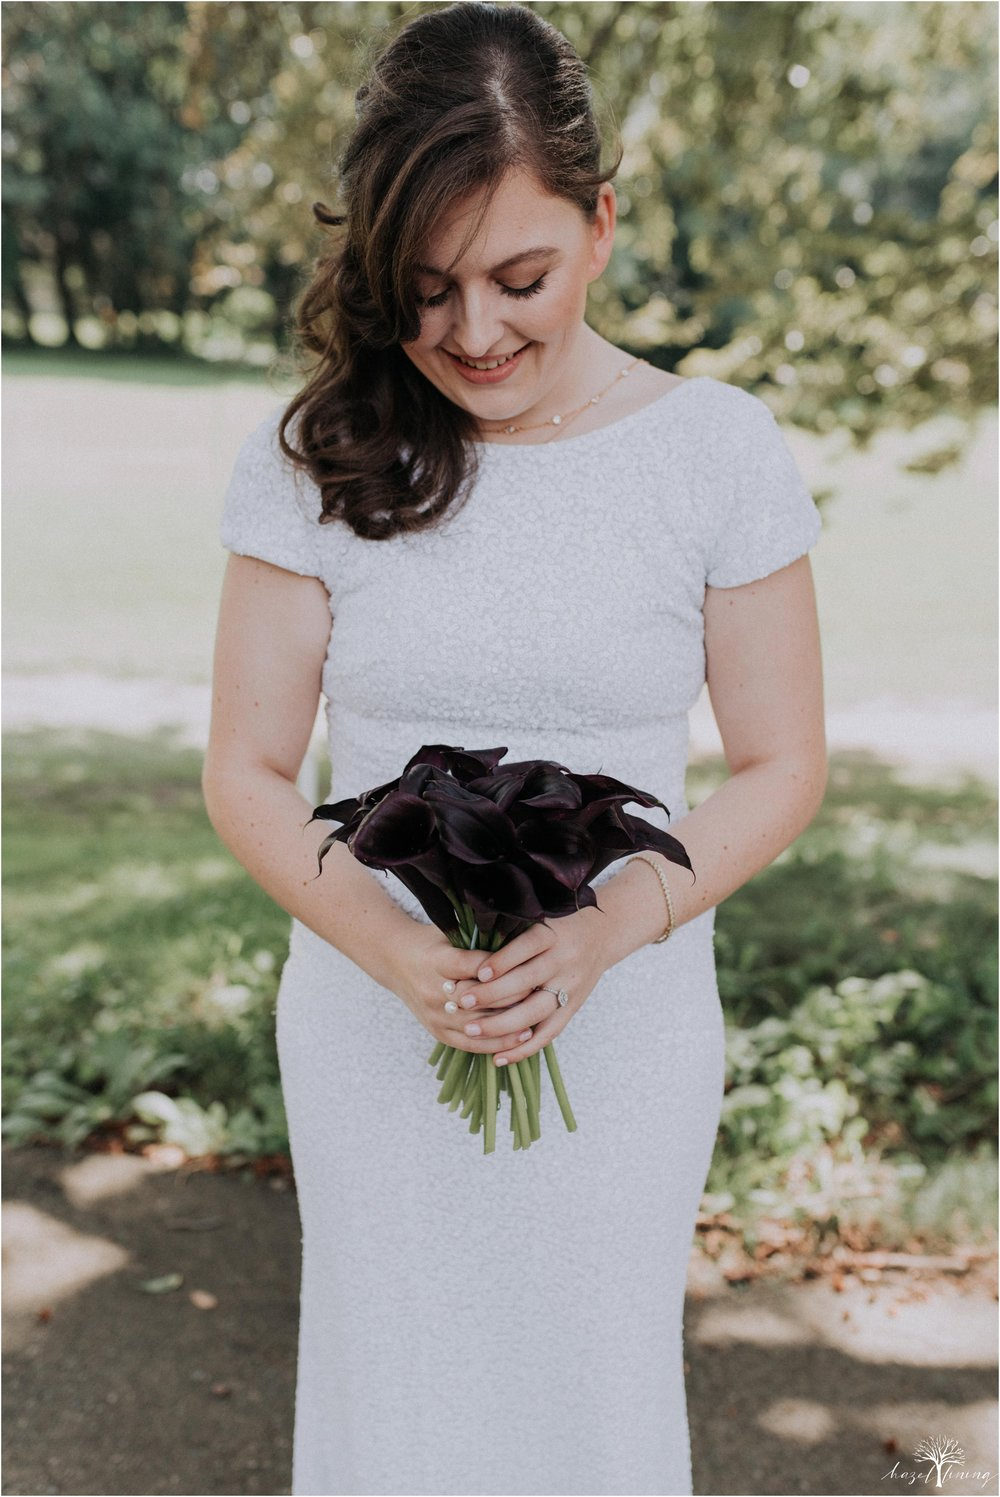 elizabeth-doelp-andrew-foreback-middletown-country-club-summer-langhorne-pennsylvania-wedding-hazel-lining-travel-wedding-elopement-photography_0046.jpg